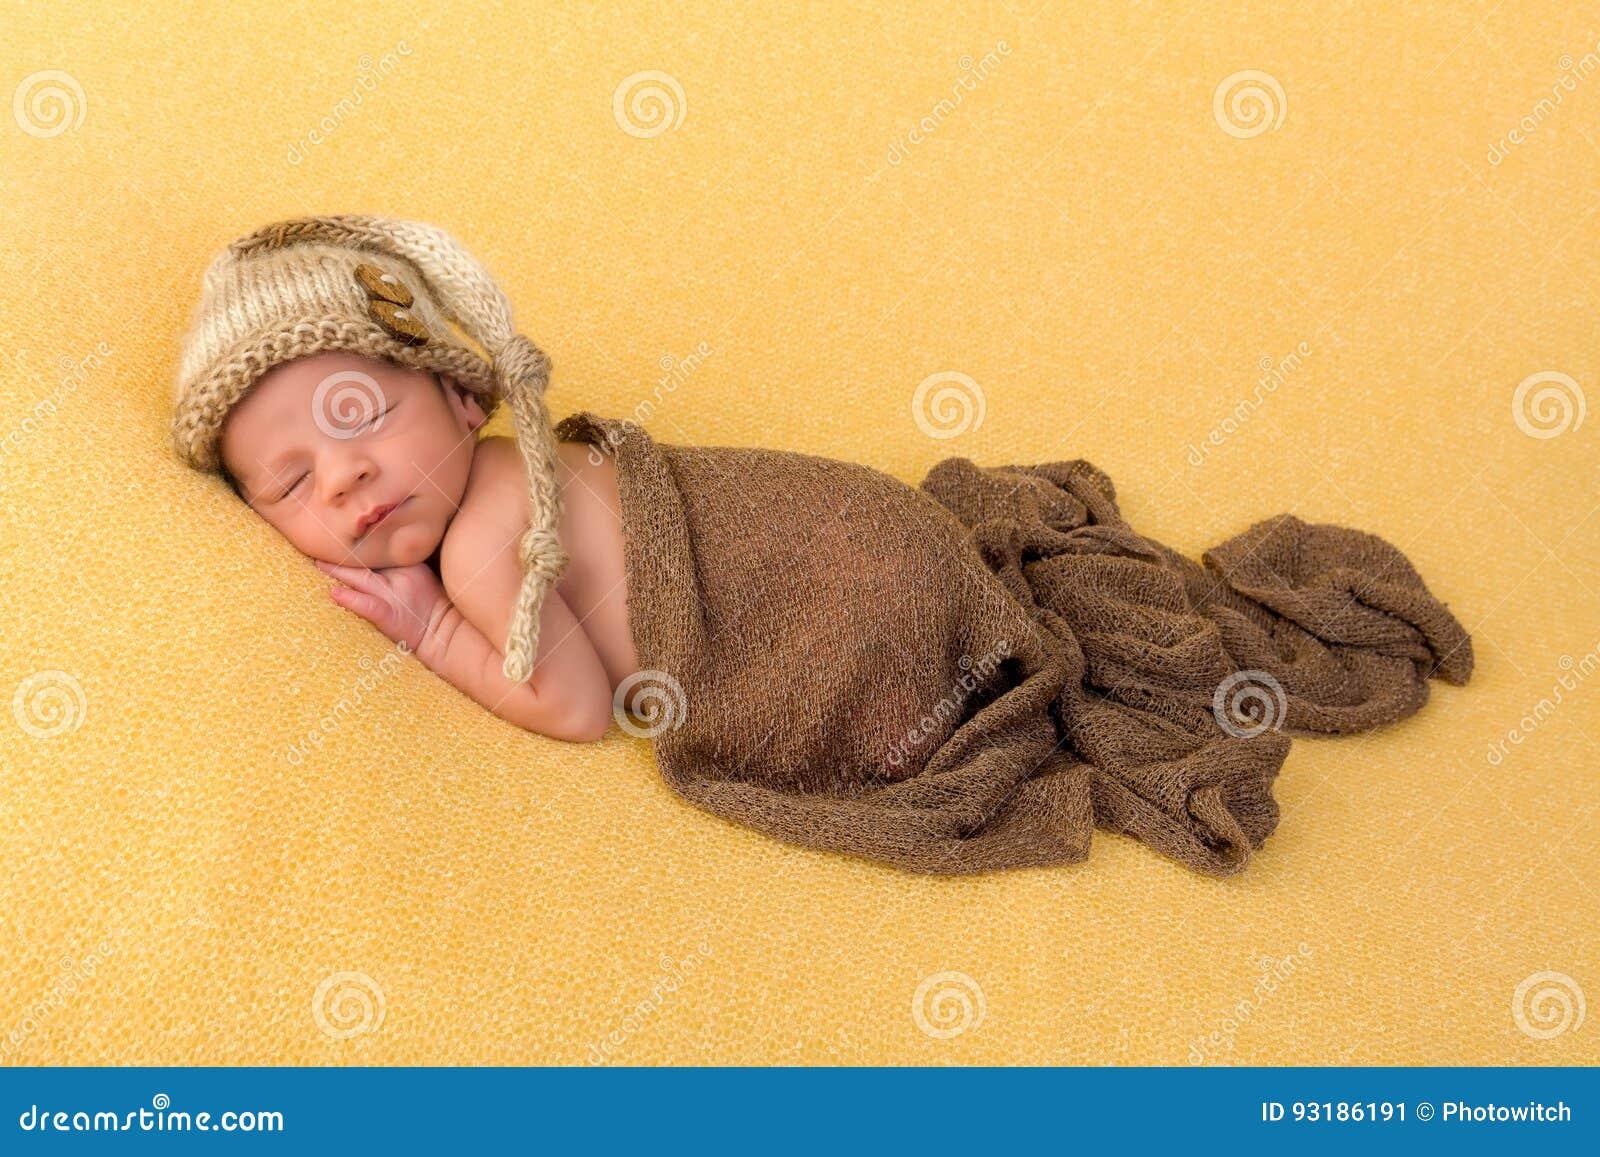 Sleepy newborn baby